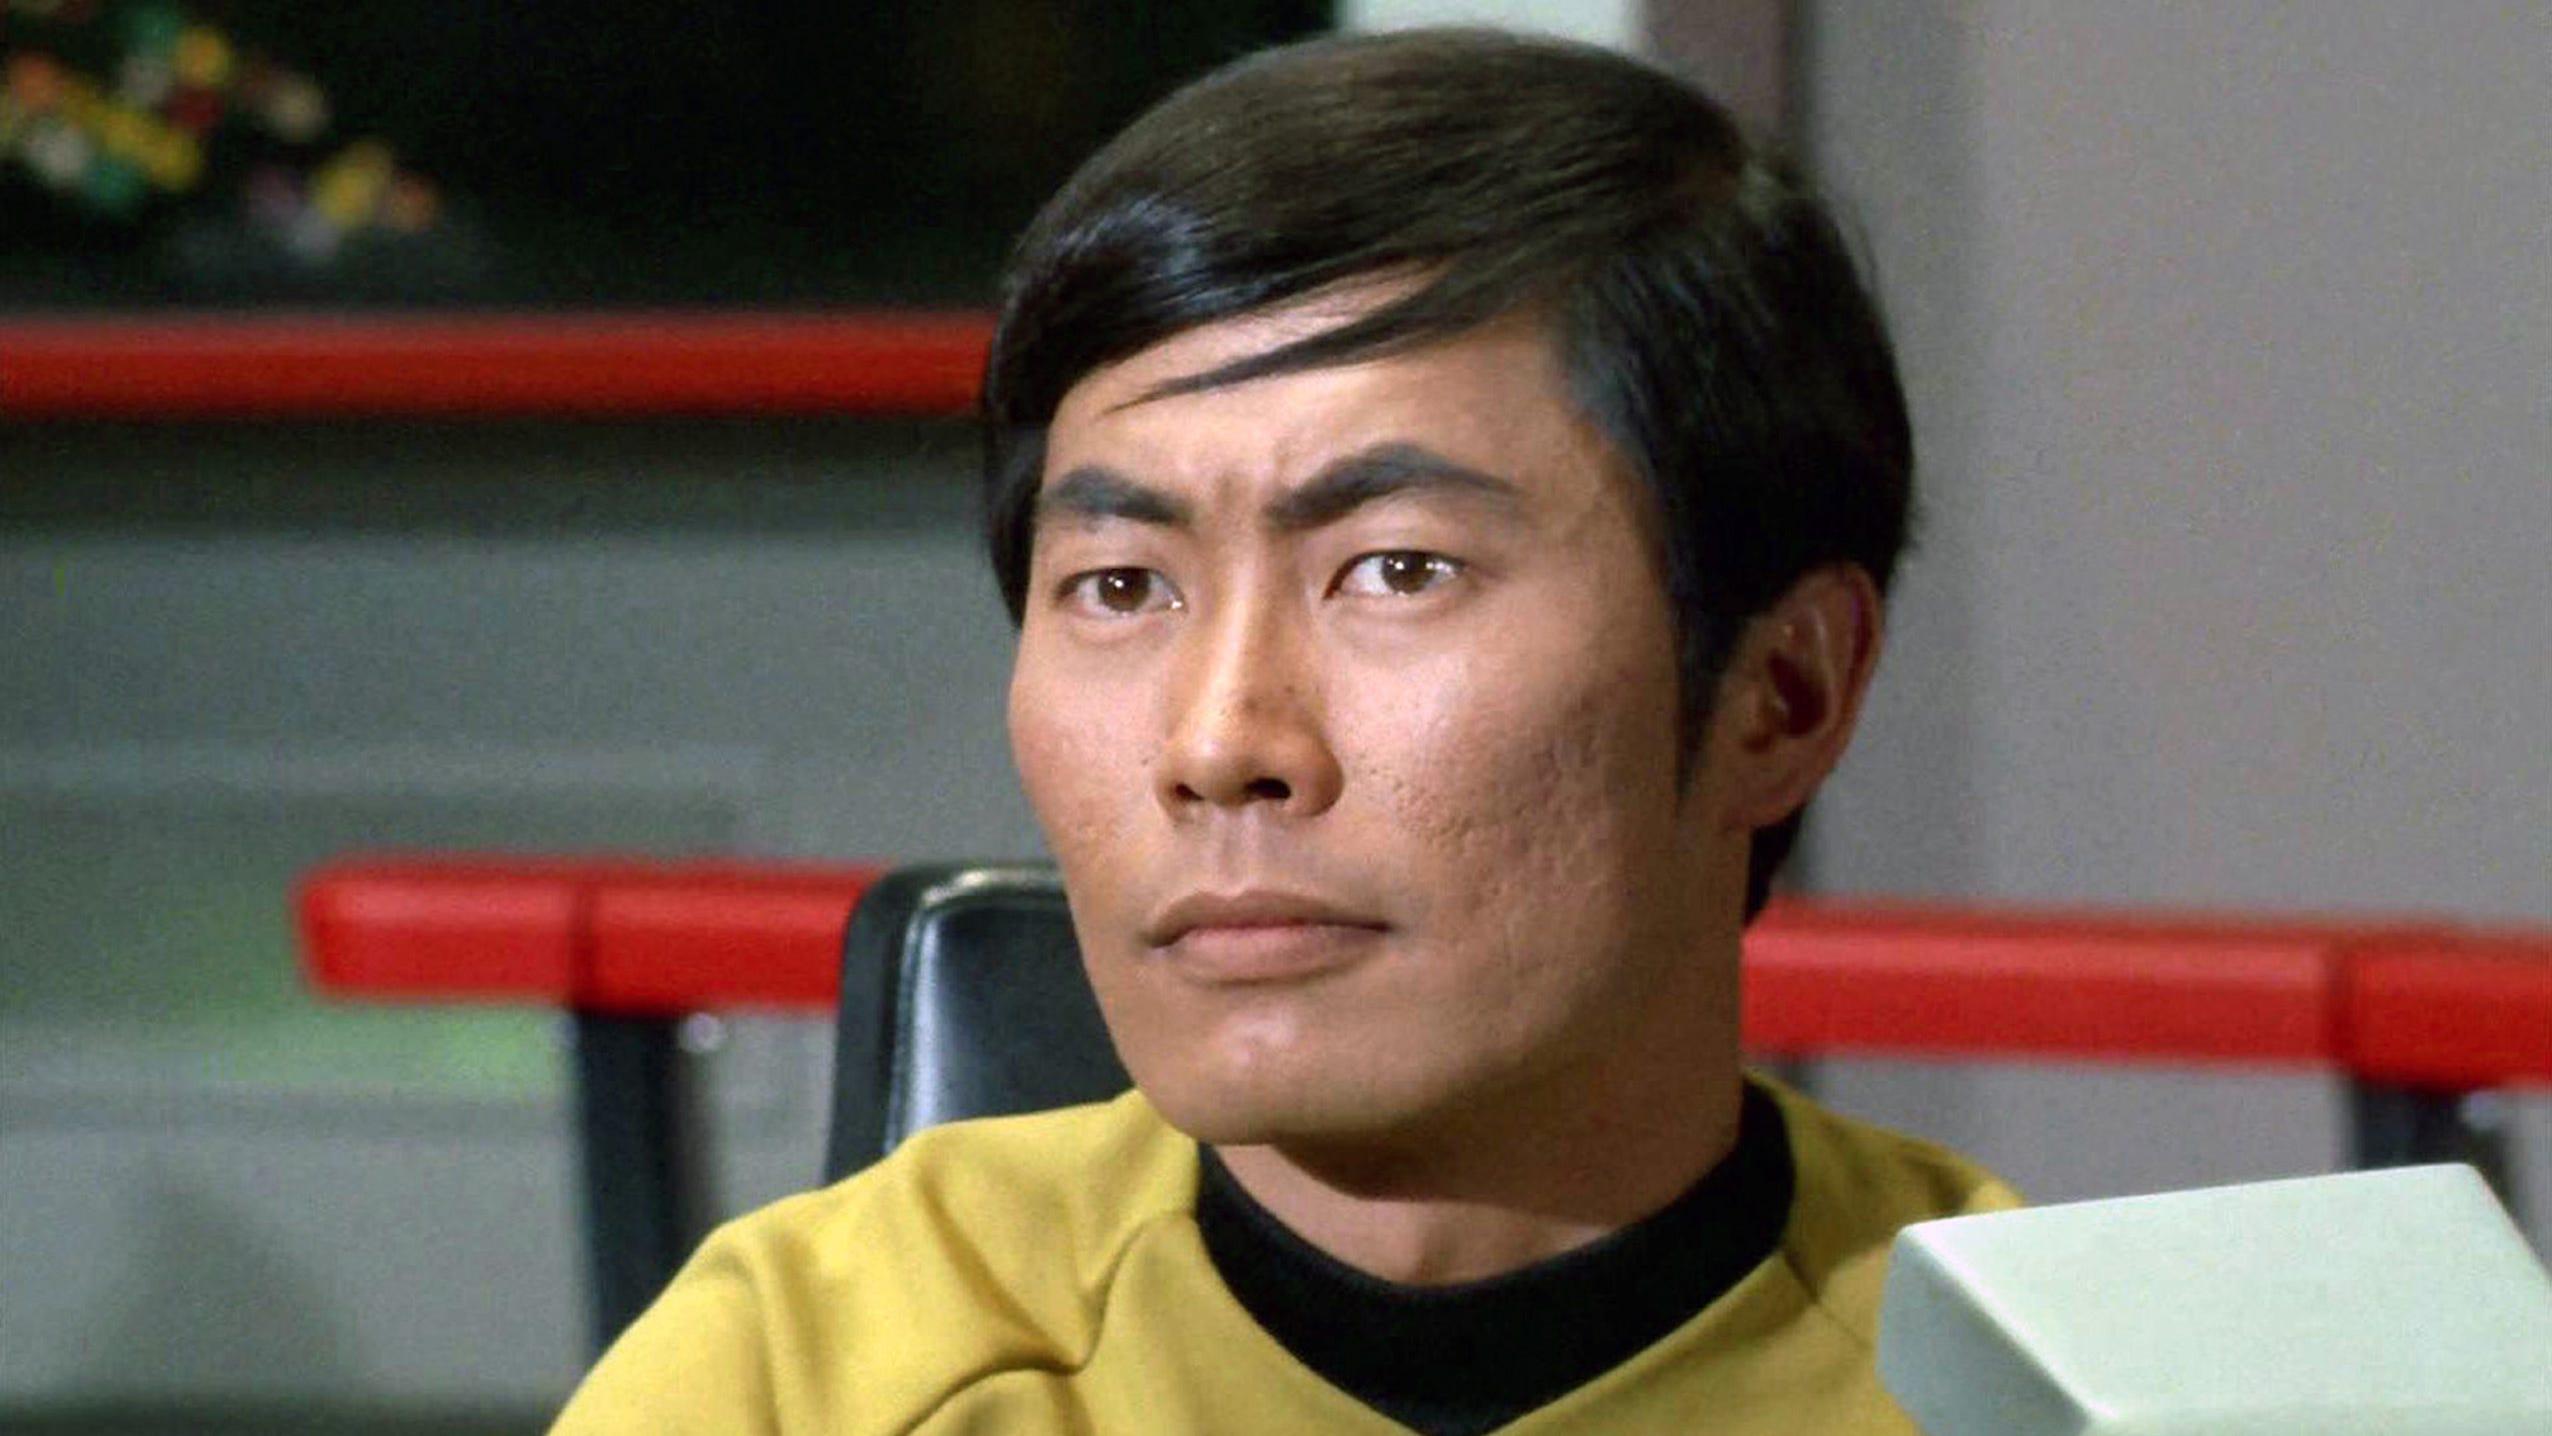 www.pnj.com: 'Star Trek' legend George Takei added to Pensacon 2022 celebrity guest lineup